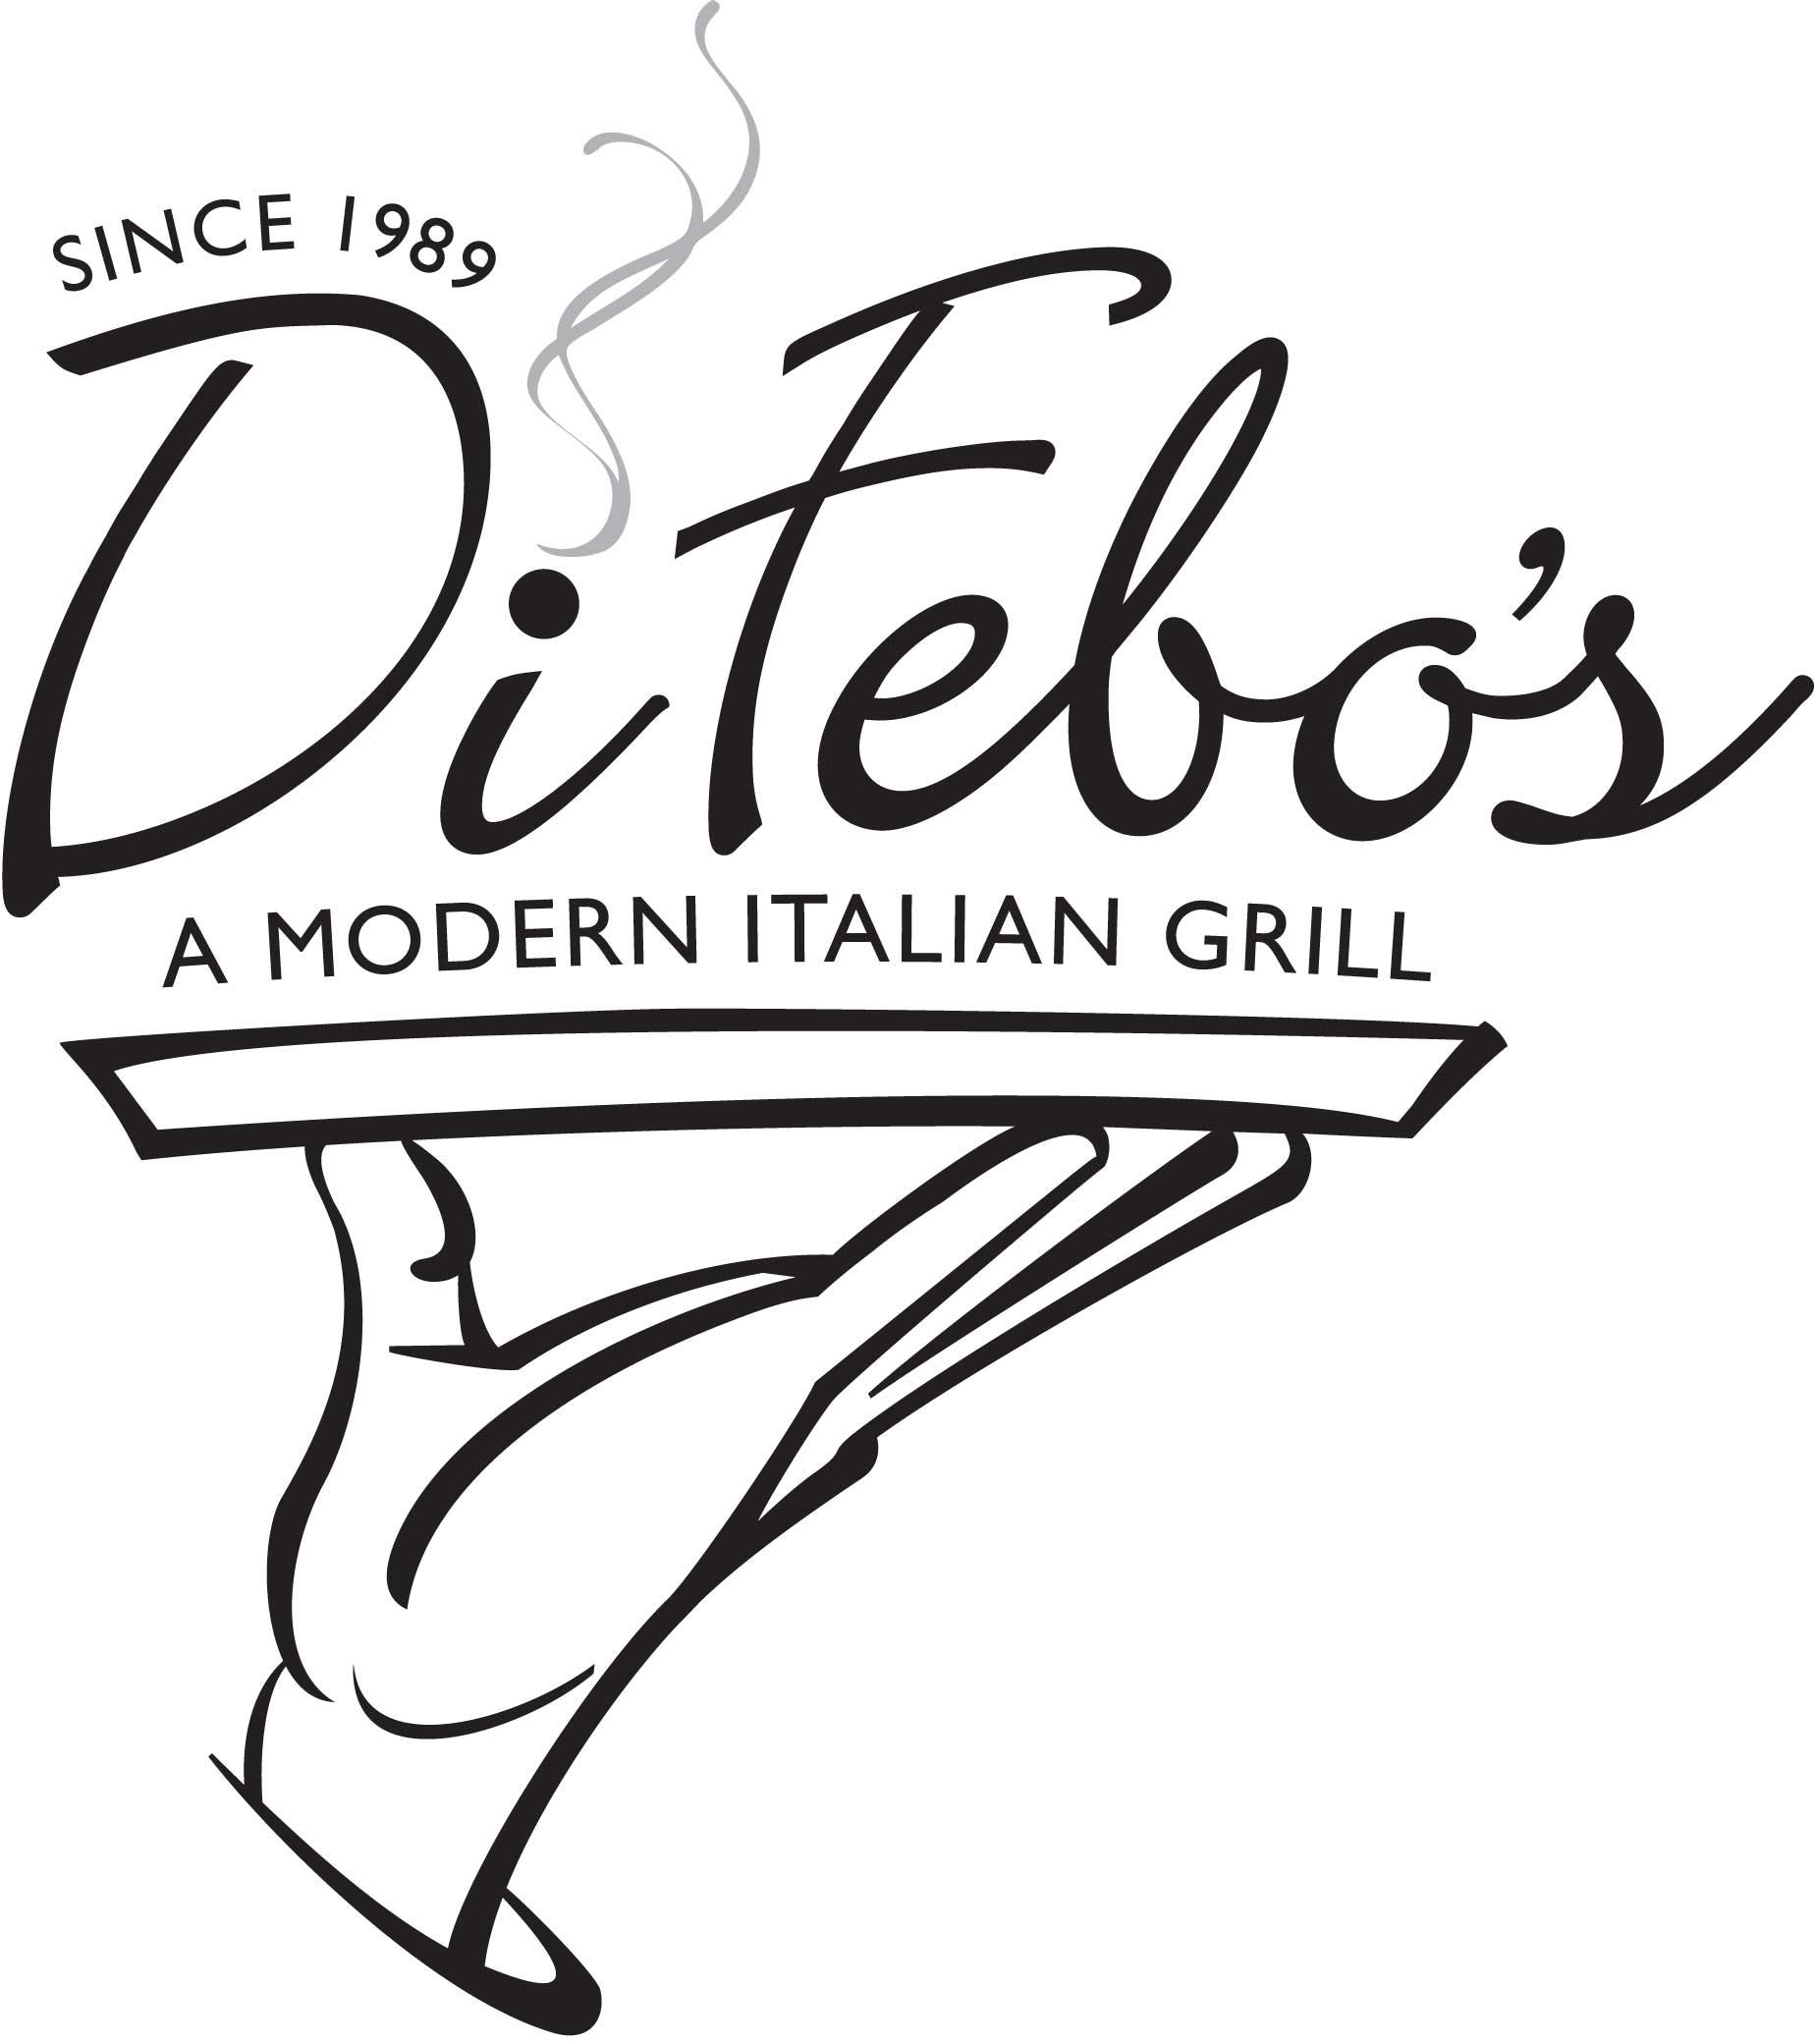 The DiFebo's Modern Italian Grill Logo